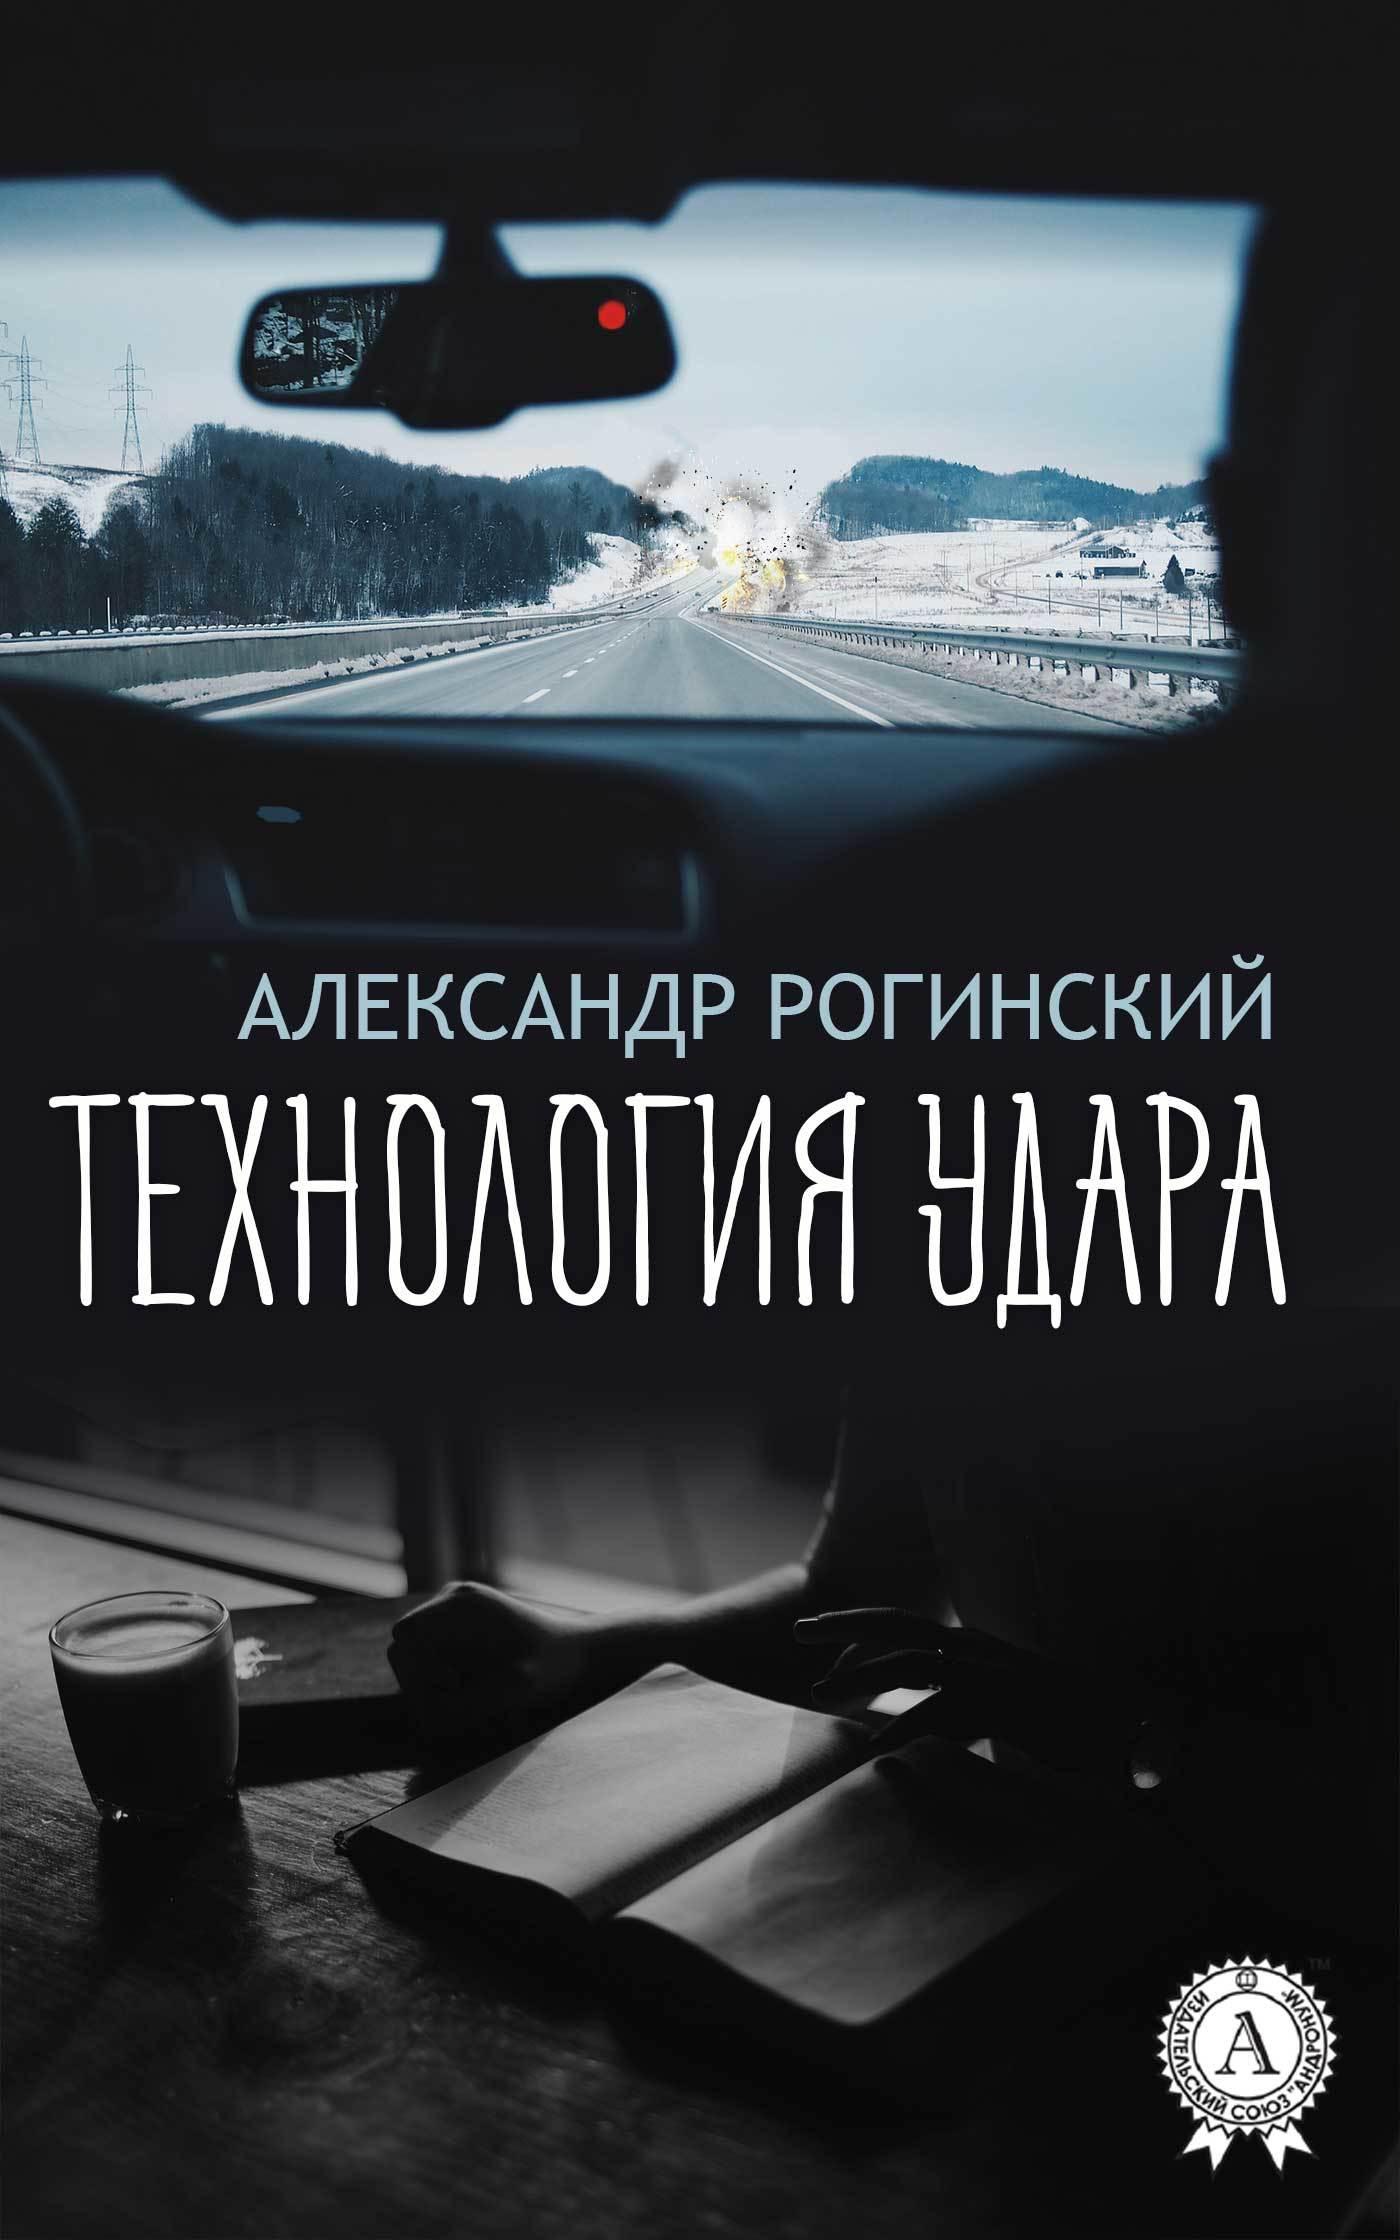 Александр Рогинский Технология удара